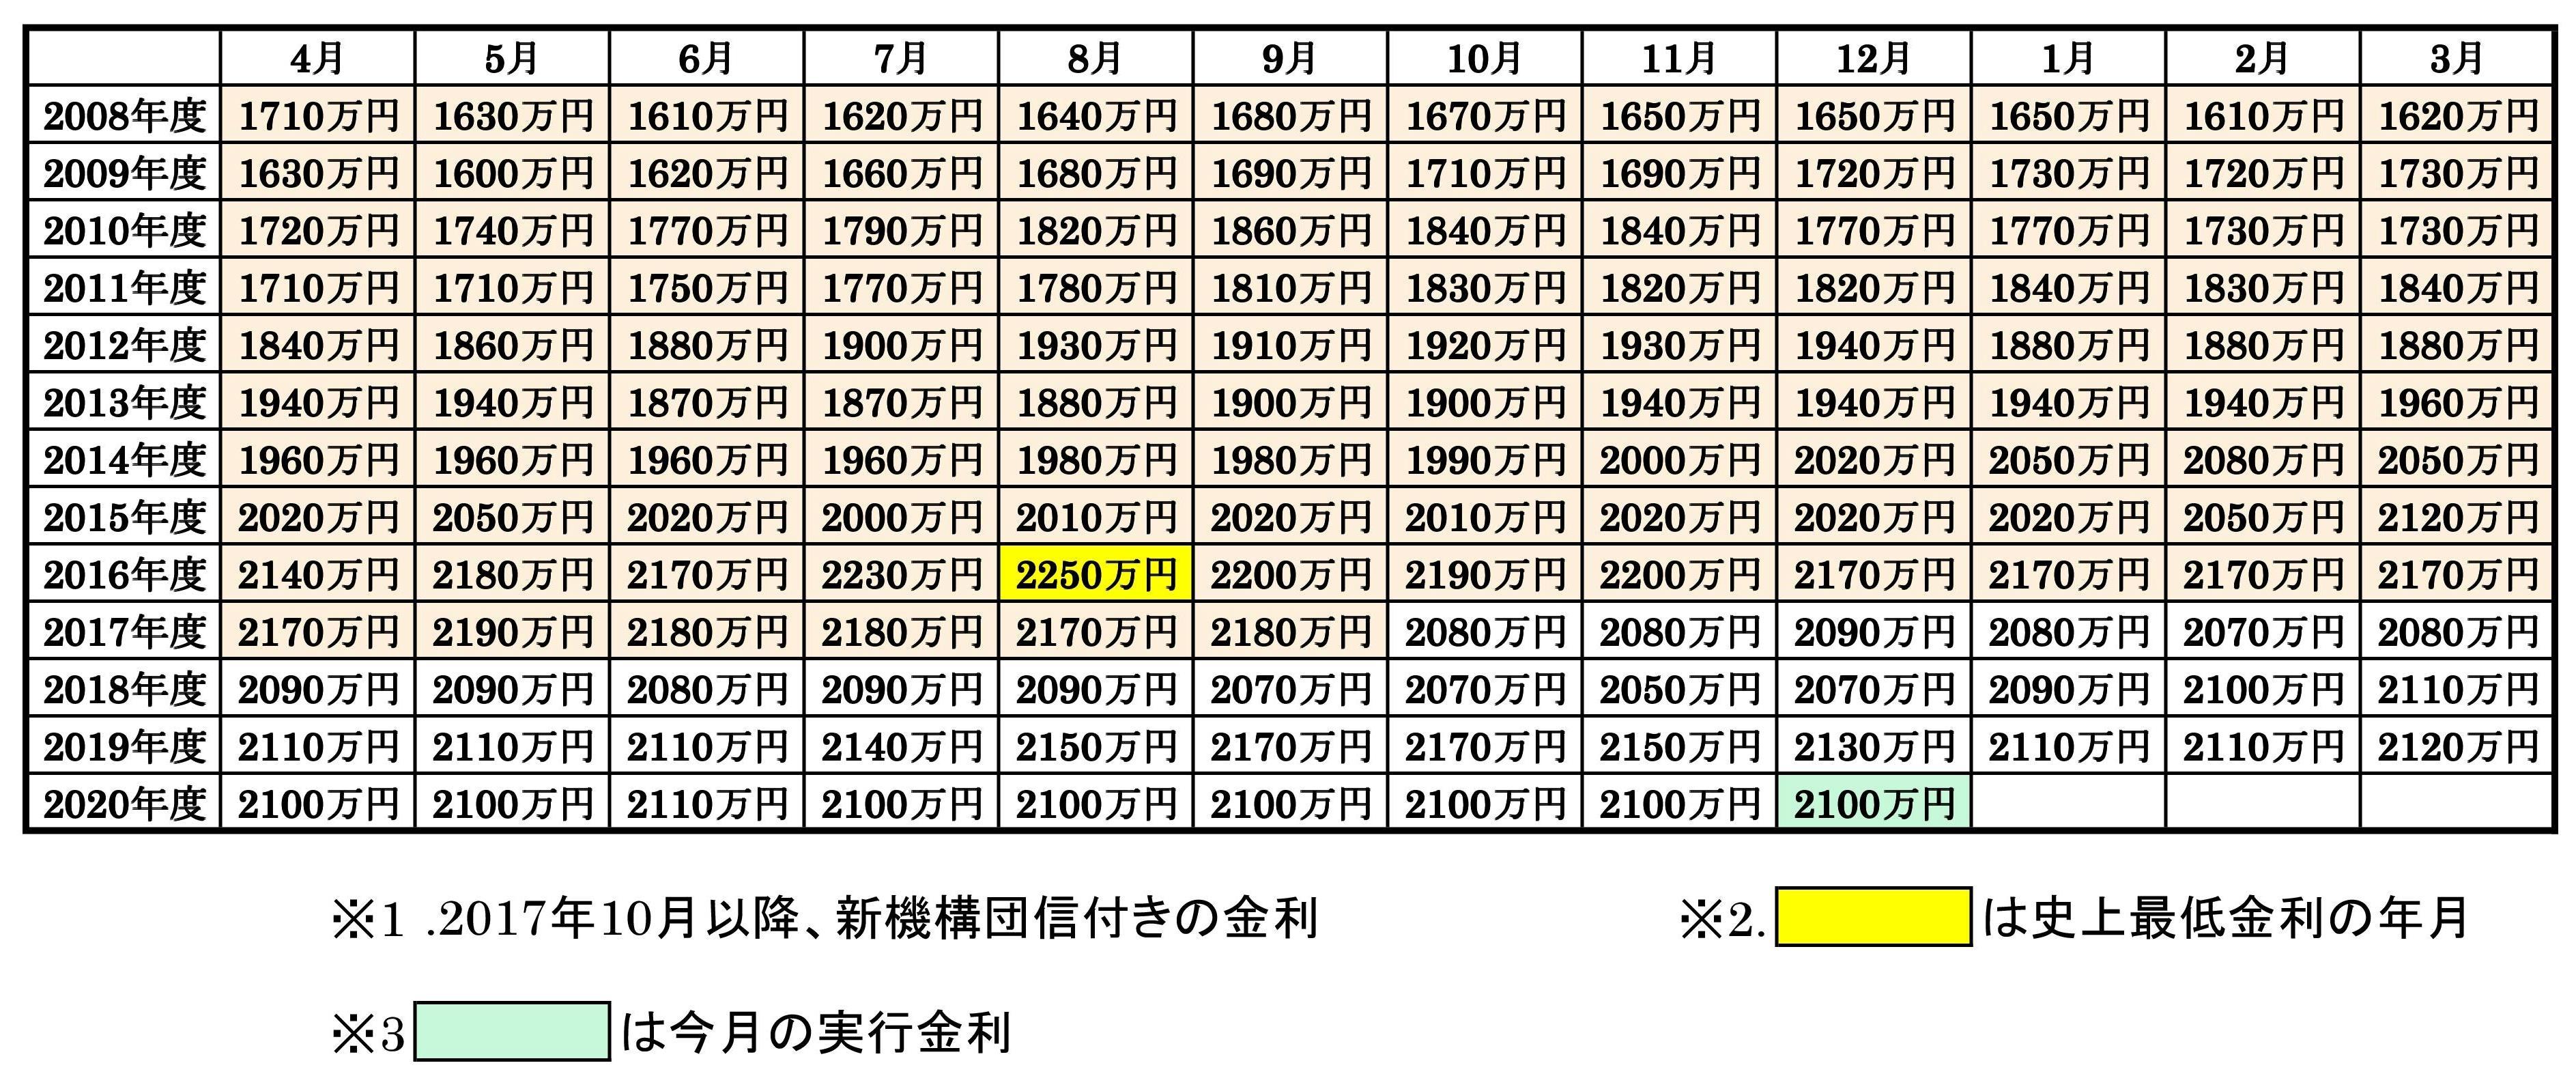 20201201kinri (5).jpg